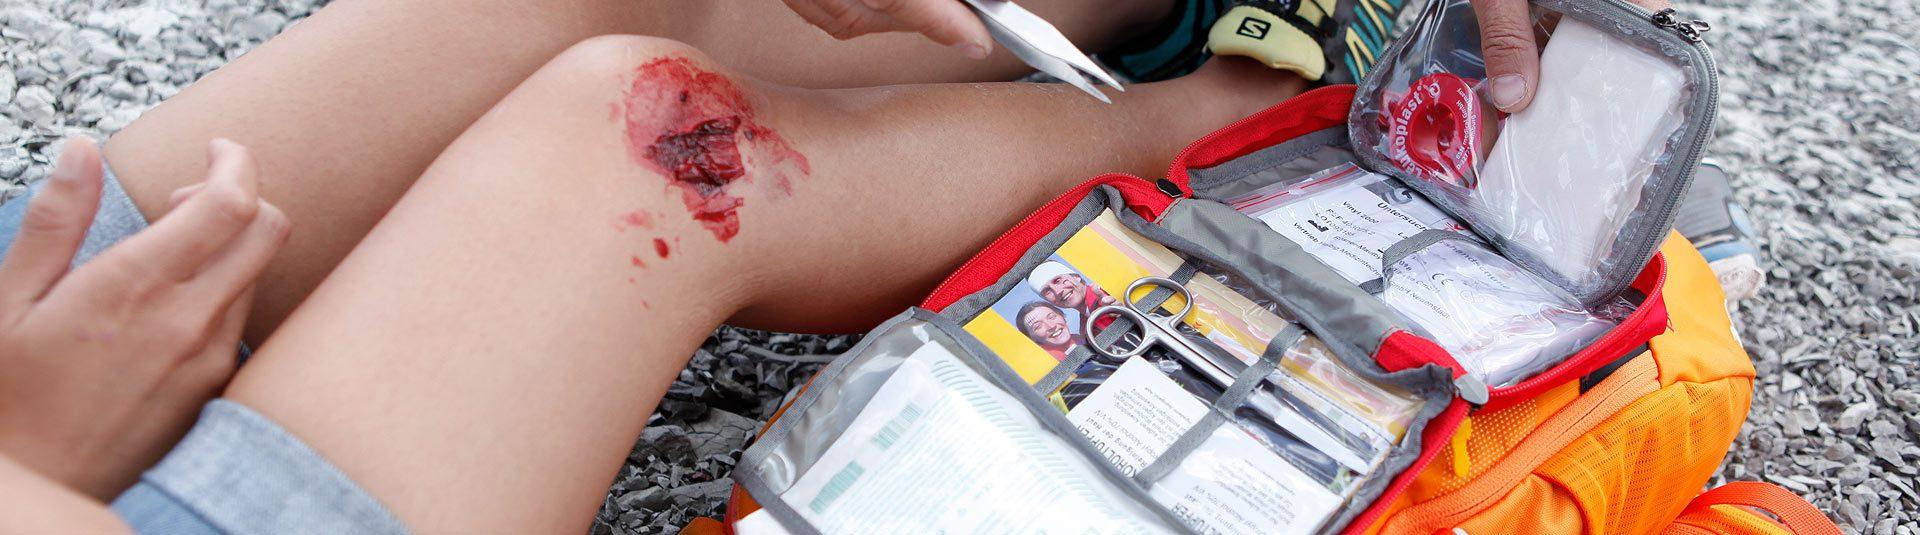 Tatonka First Aid Equipment